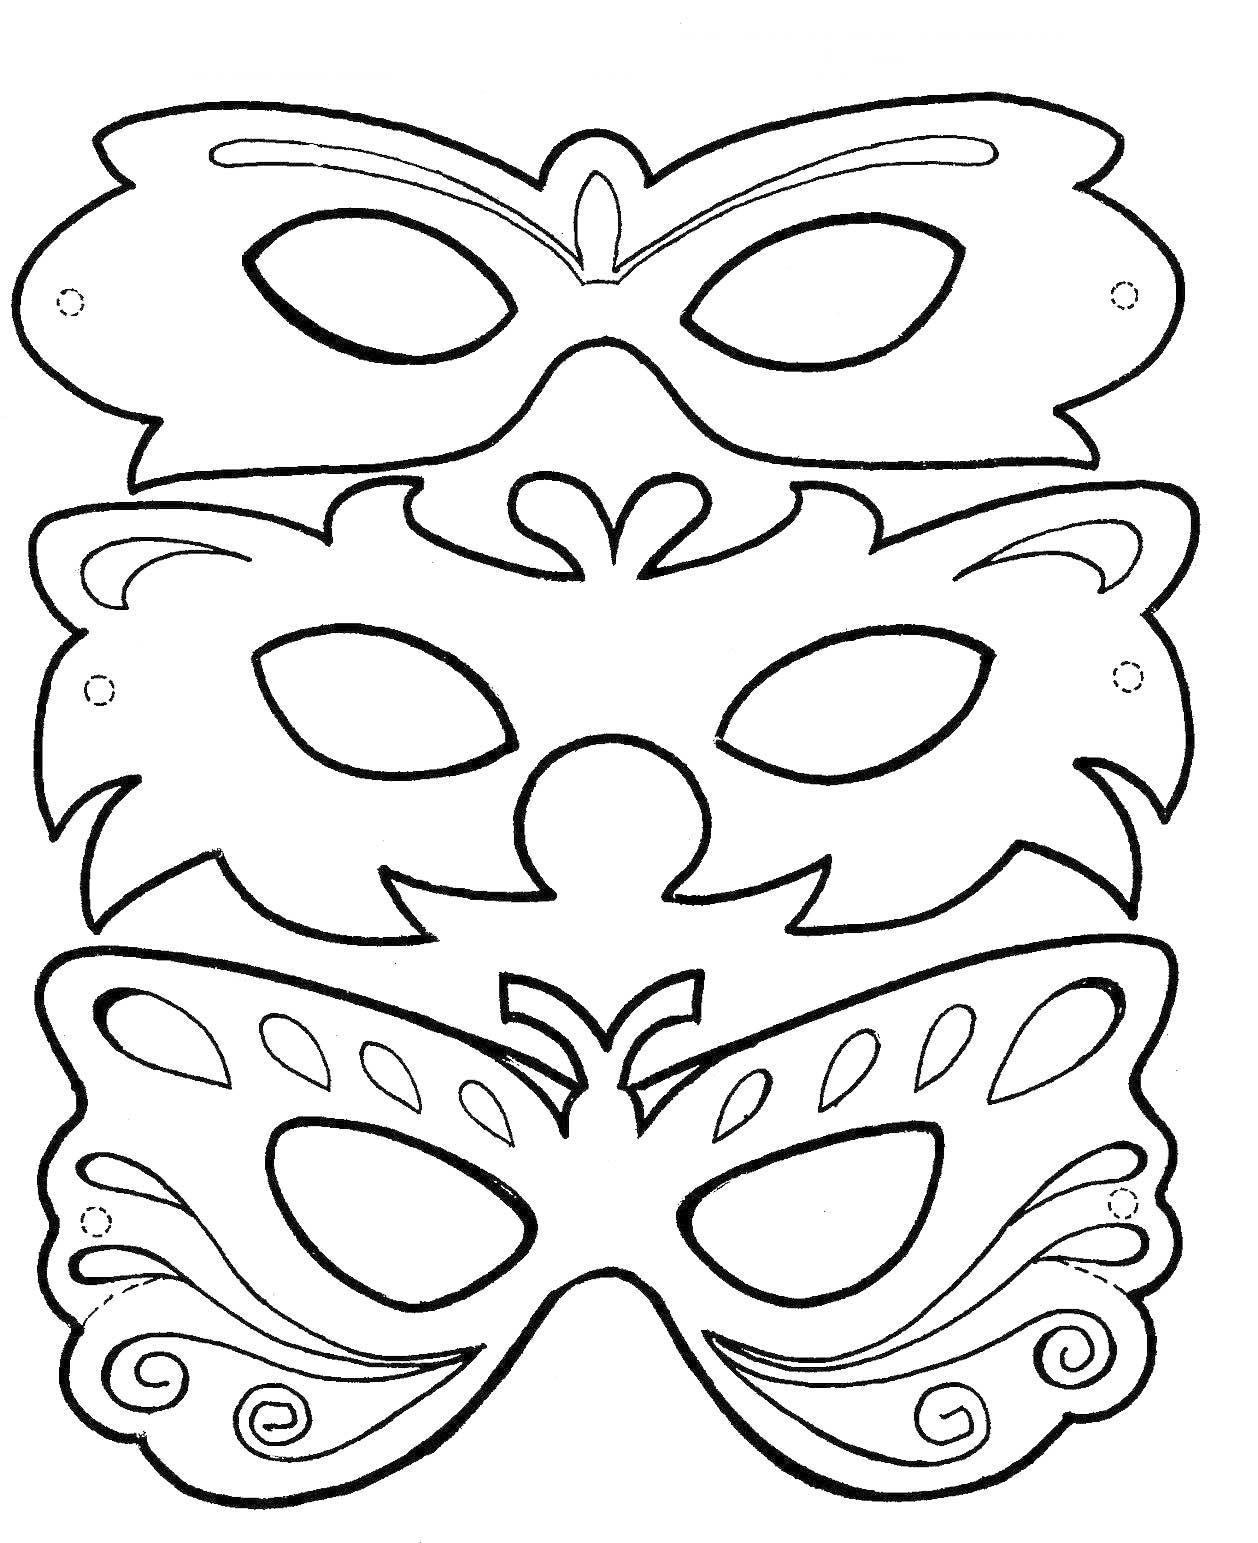 Máscara de payaso para colorear | Máscaras de Carnaval